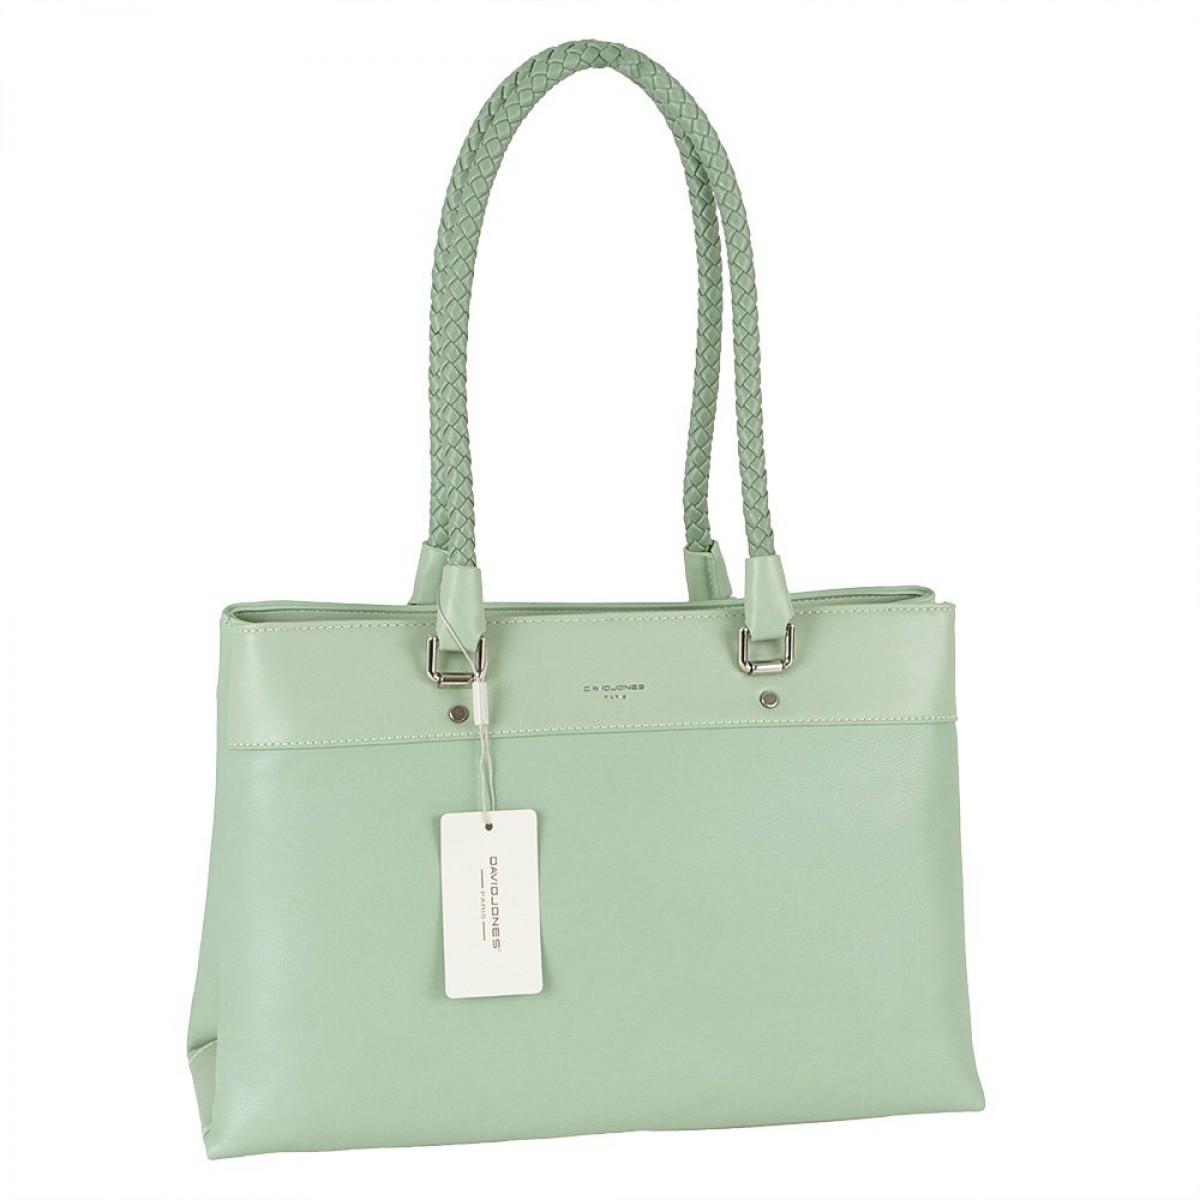 Жіноча сумка David Jones 6314-2 LIGHT GREEN